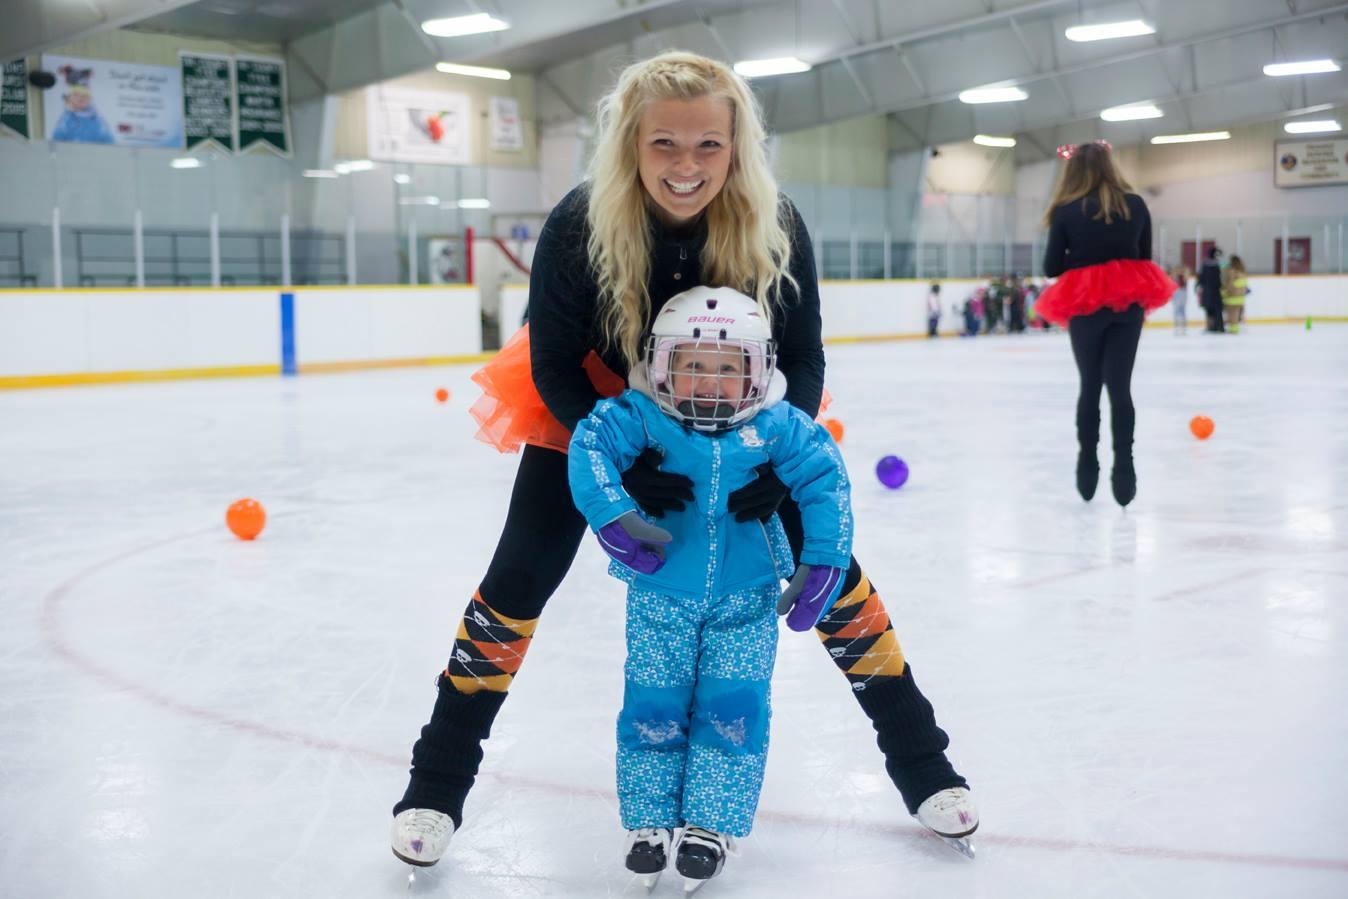 Pre-Canskate Intro to Skating